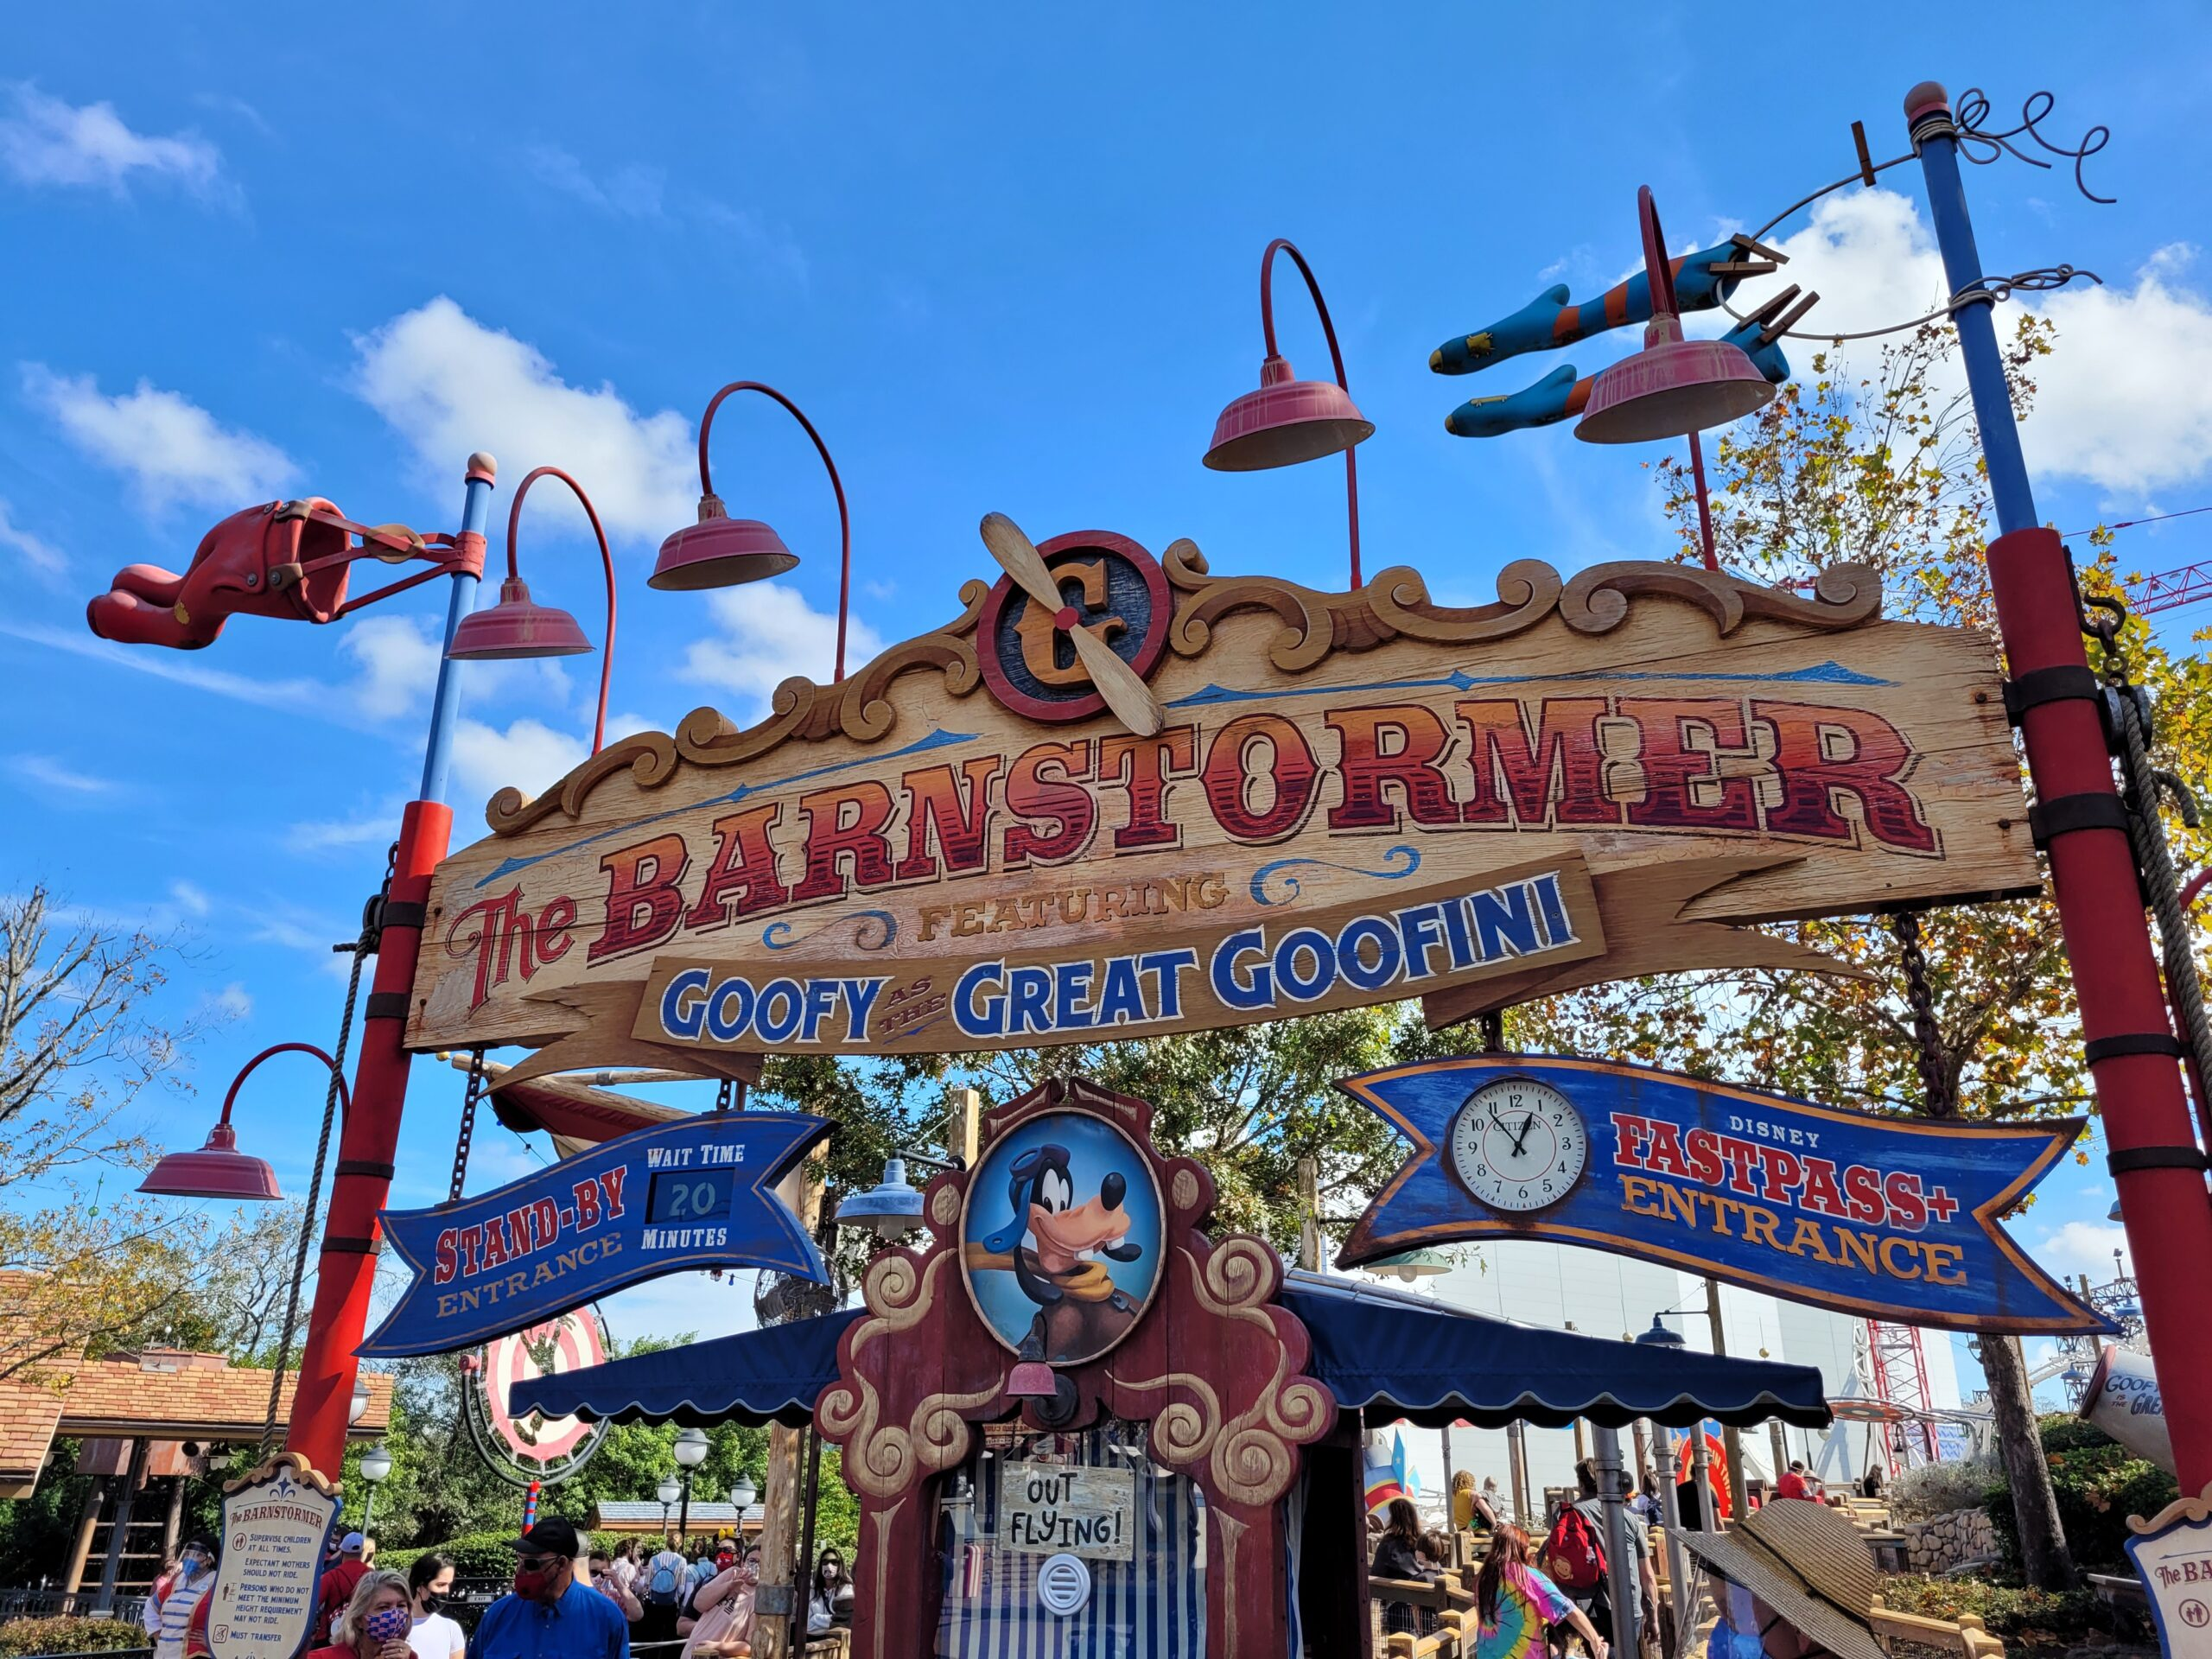 Entrance to the Barnstormer at Disney World